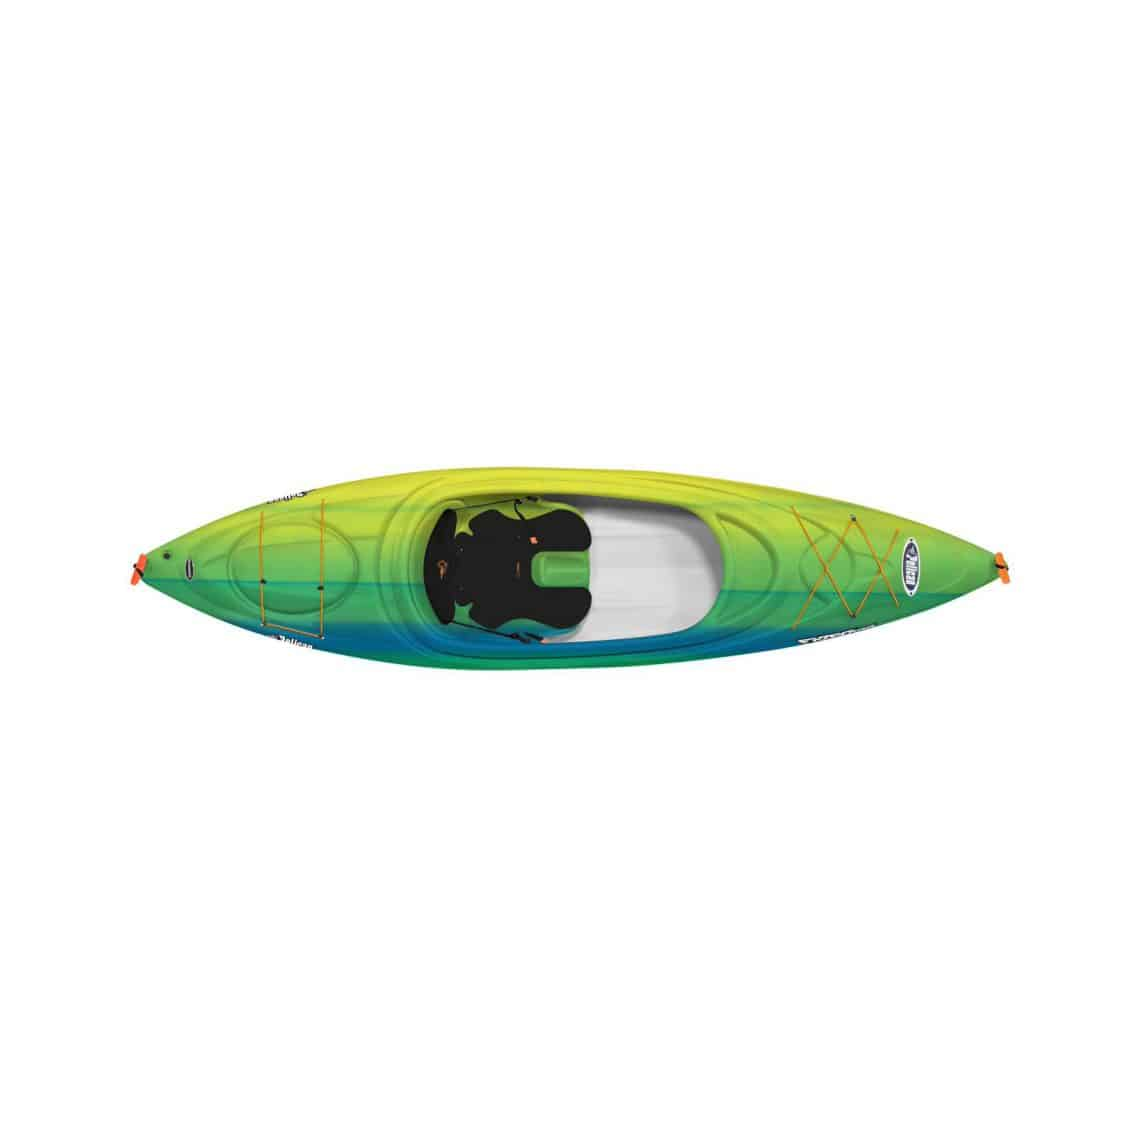 Pelican Fazer 100 Kayak Northwoods Wholesale Outlet